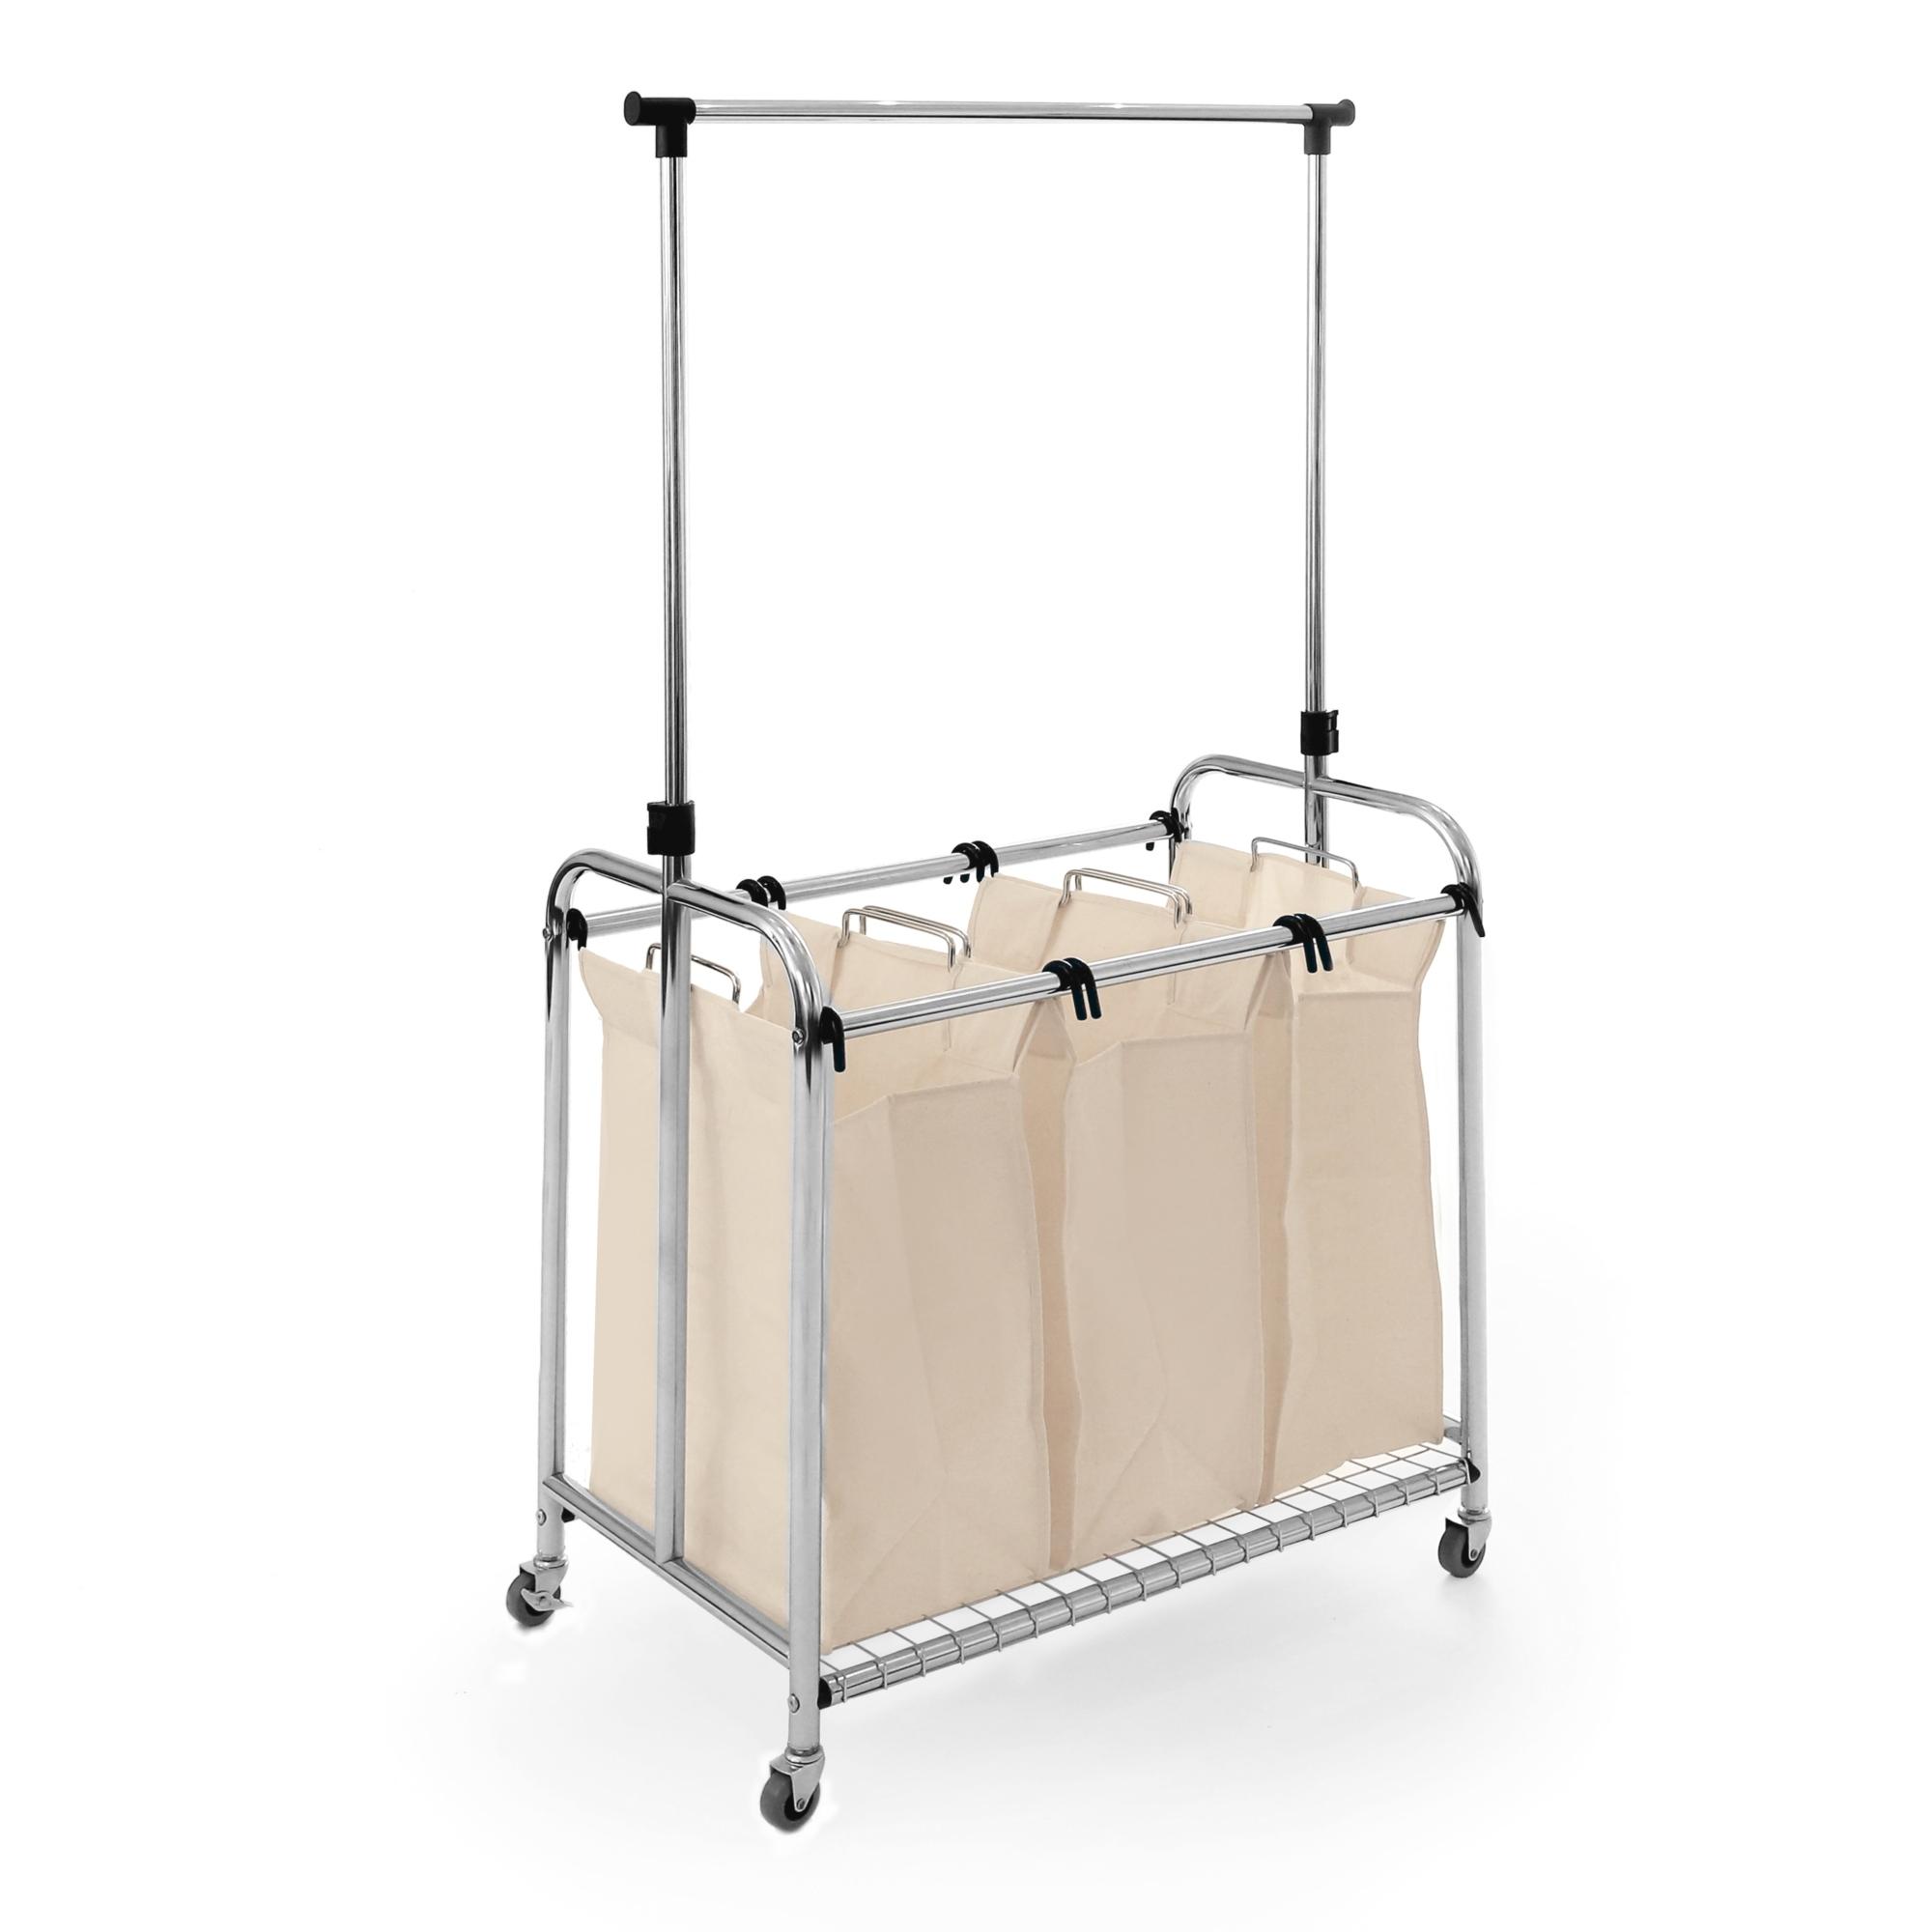 Seville Classics 3-Bag Laundry Hamper/Sorter Cart with Clothes Rack